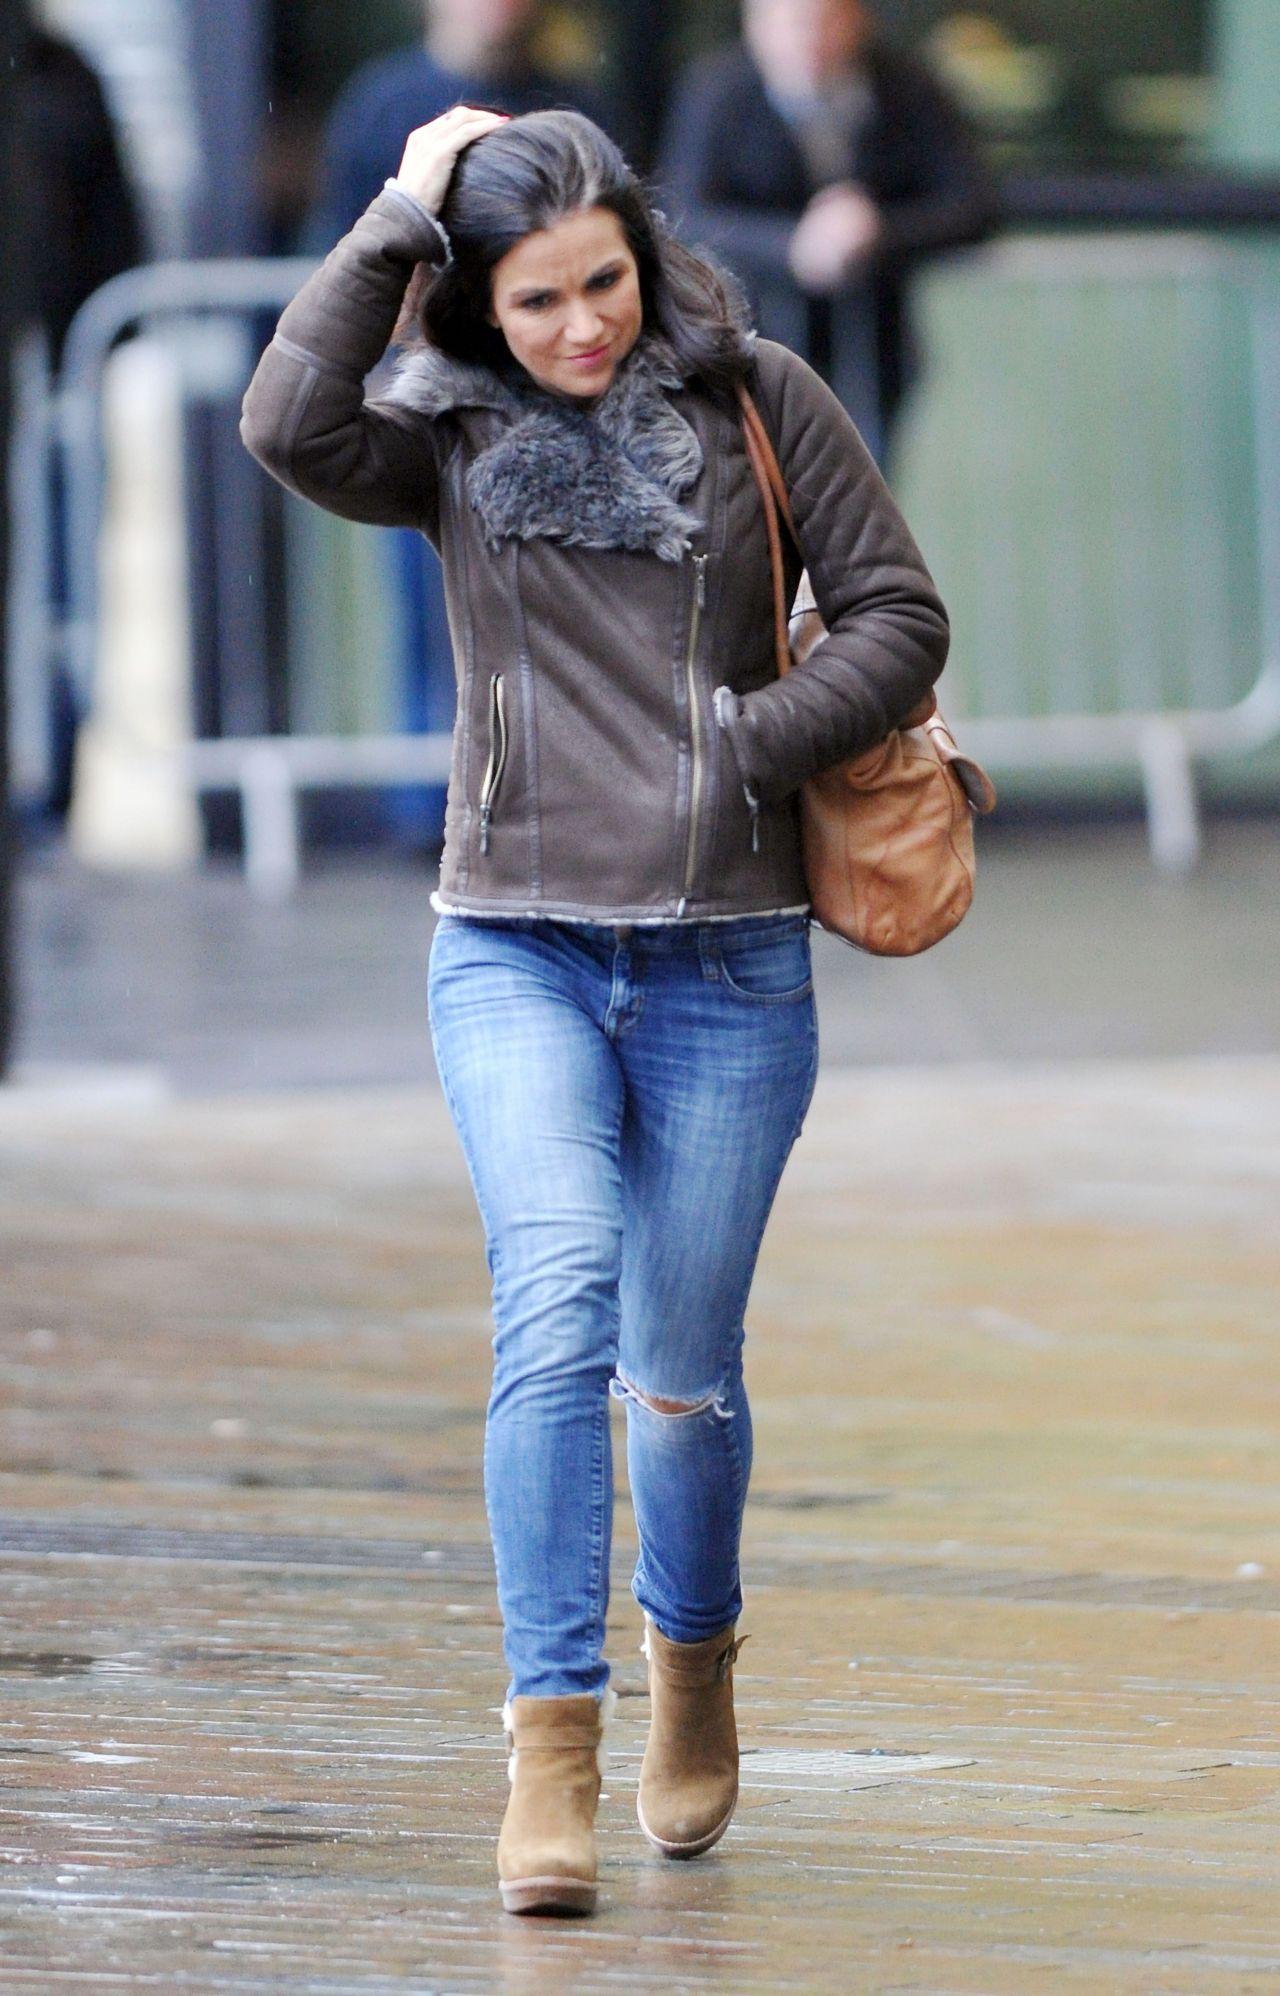 Susanna Reid In Tight Jeans - Bbc Media Studios Manchester -5675